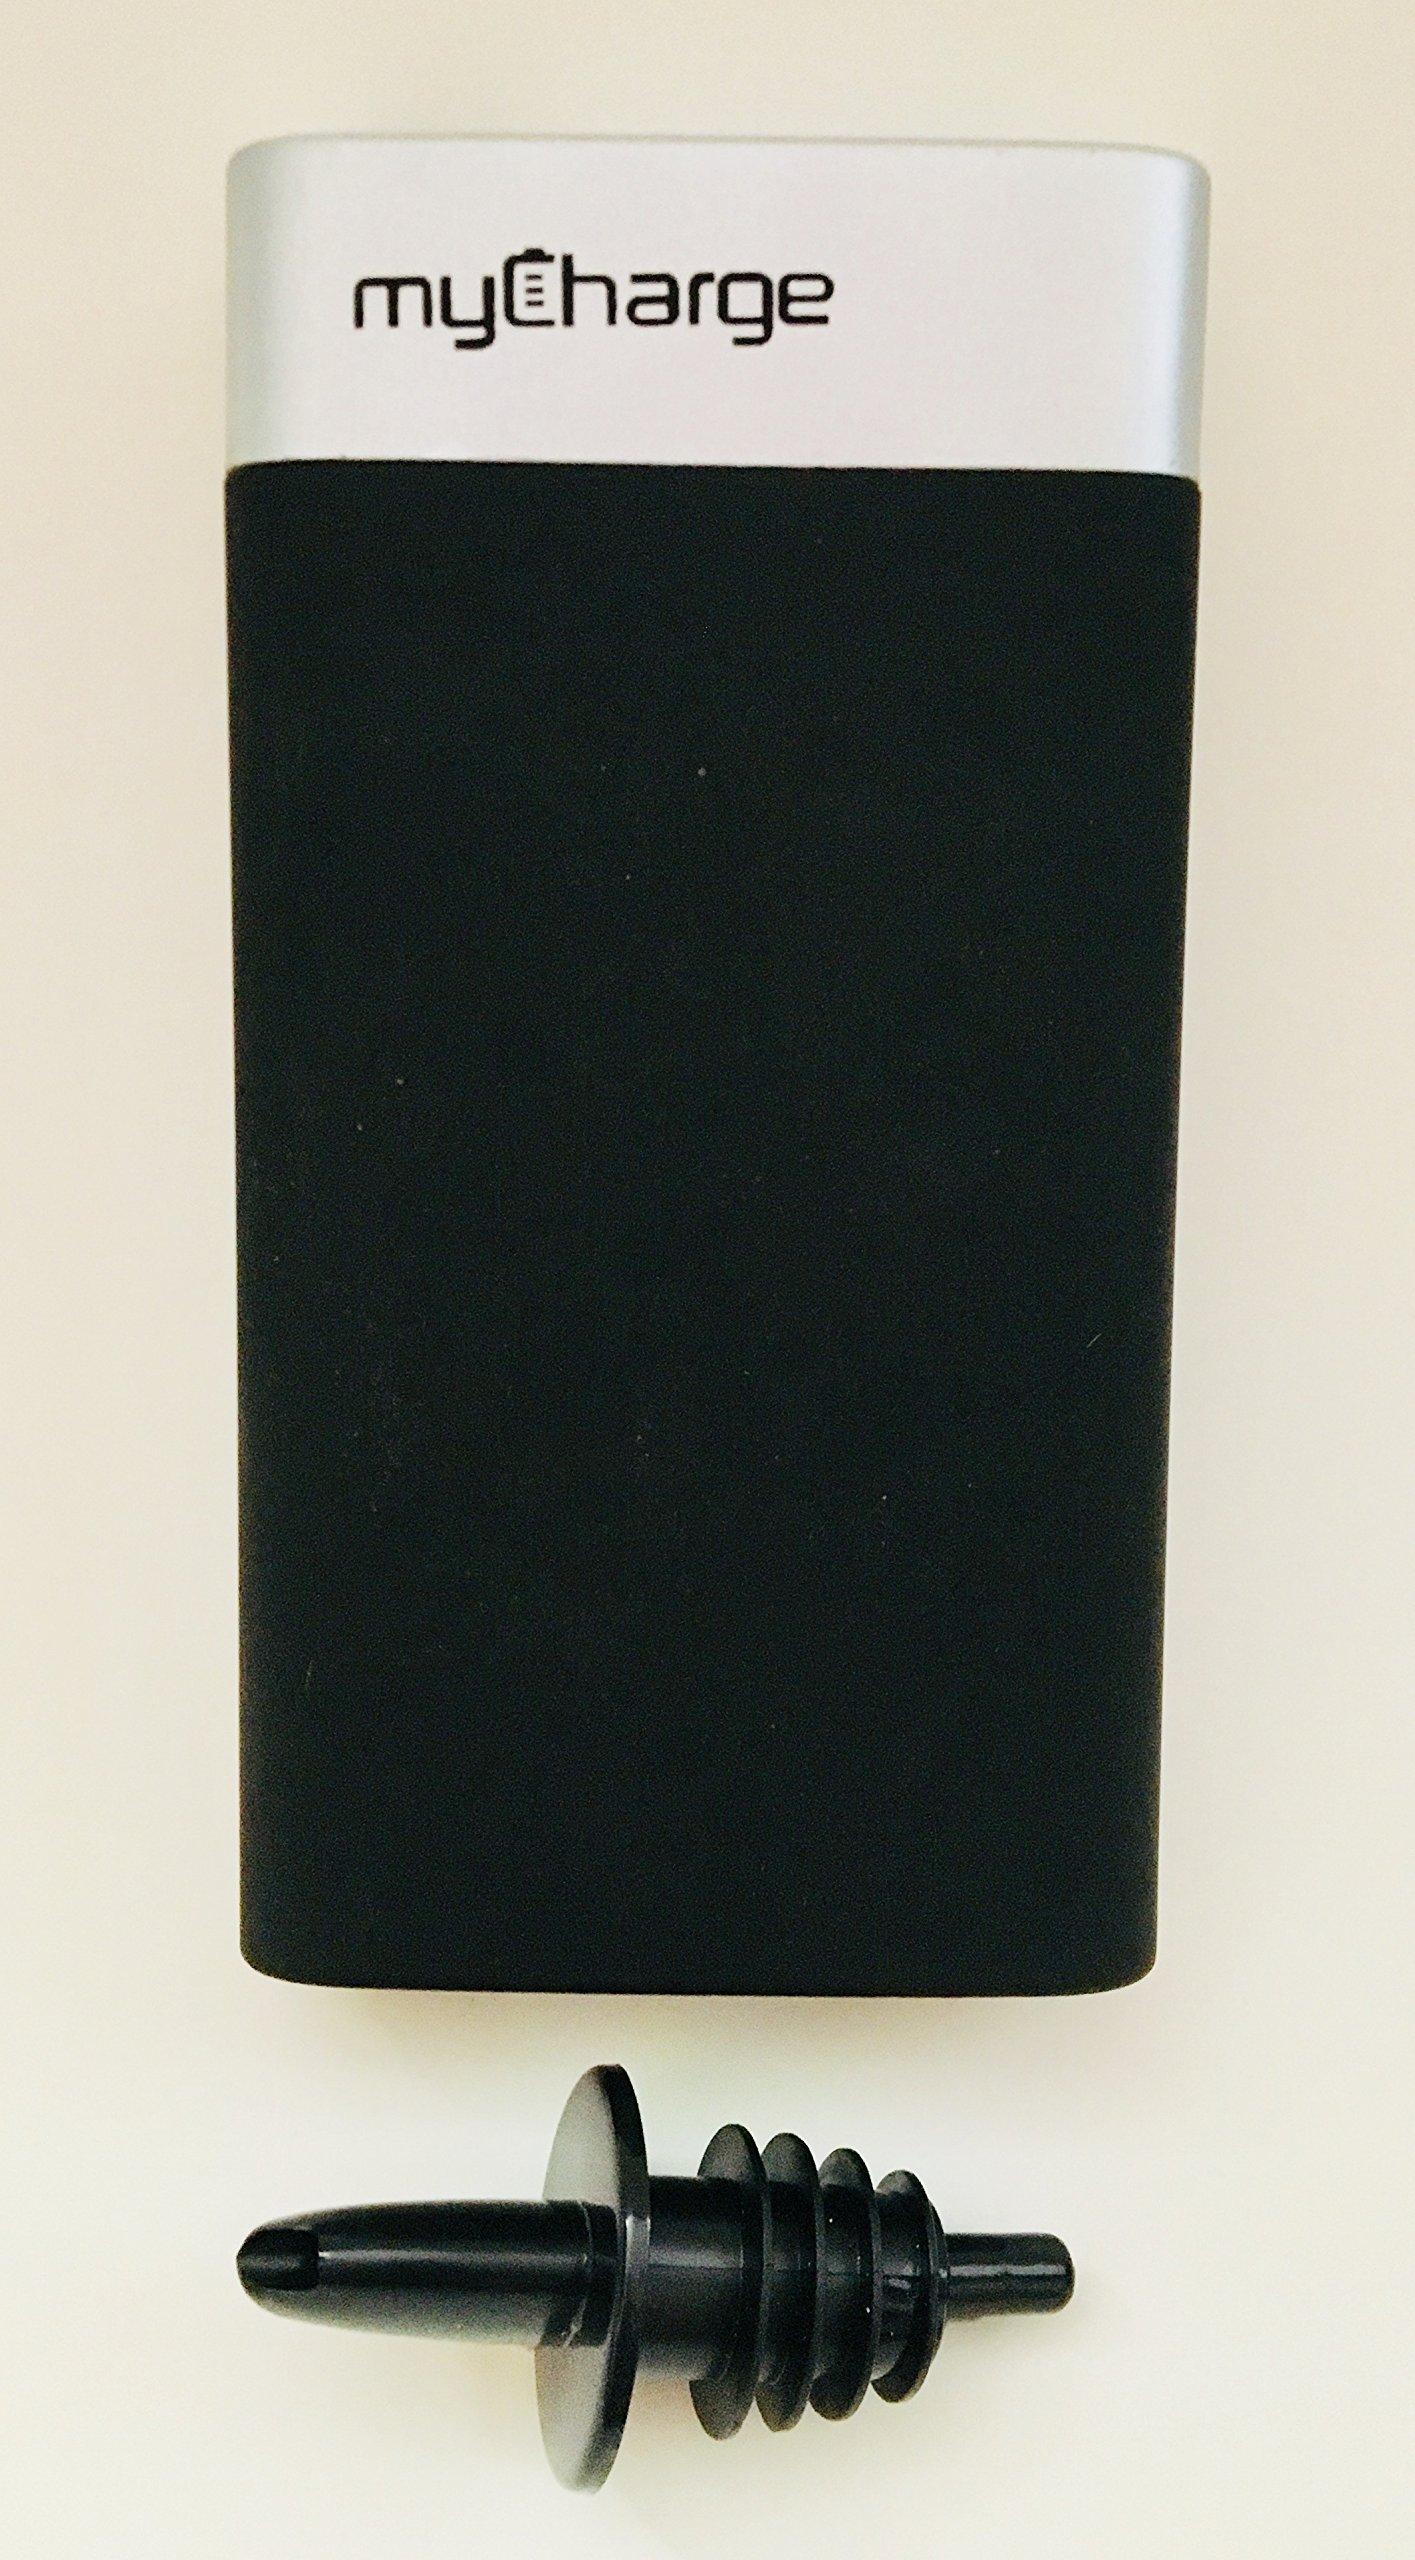 Binocktails Bev-Bank Hidden Power Bank Flask - Holds approximately 8 oz. (235 ml) by Binocktails